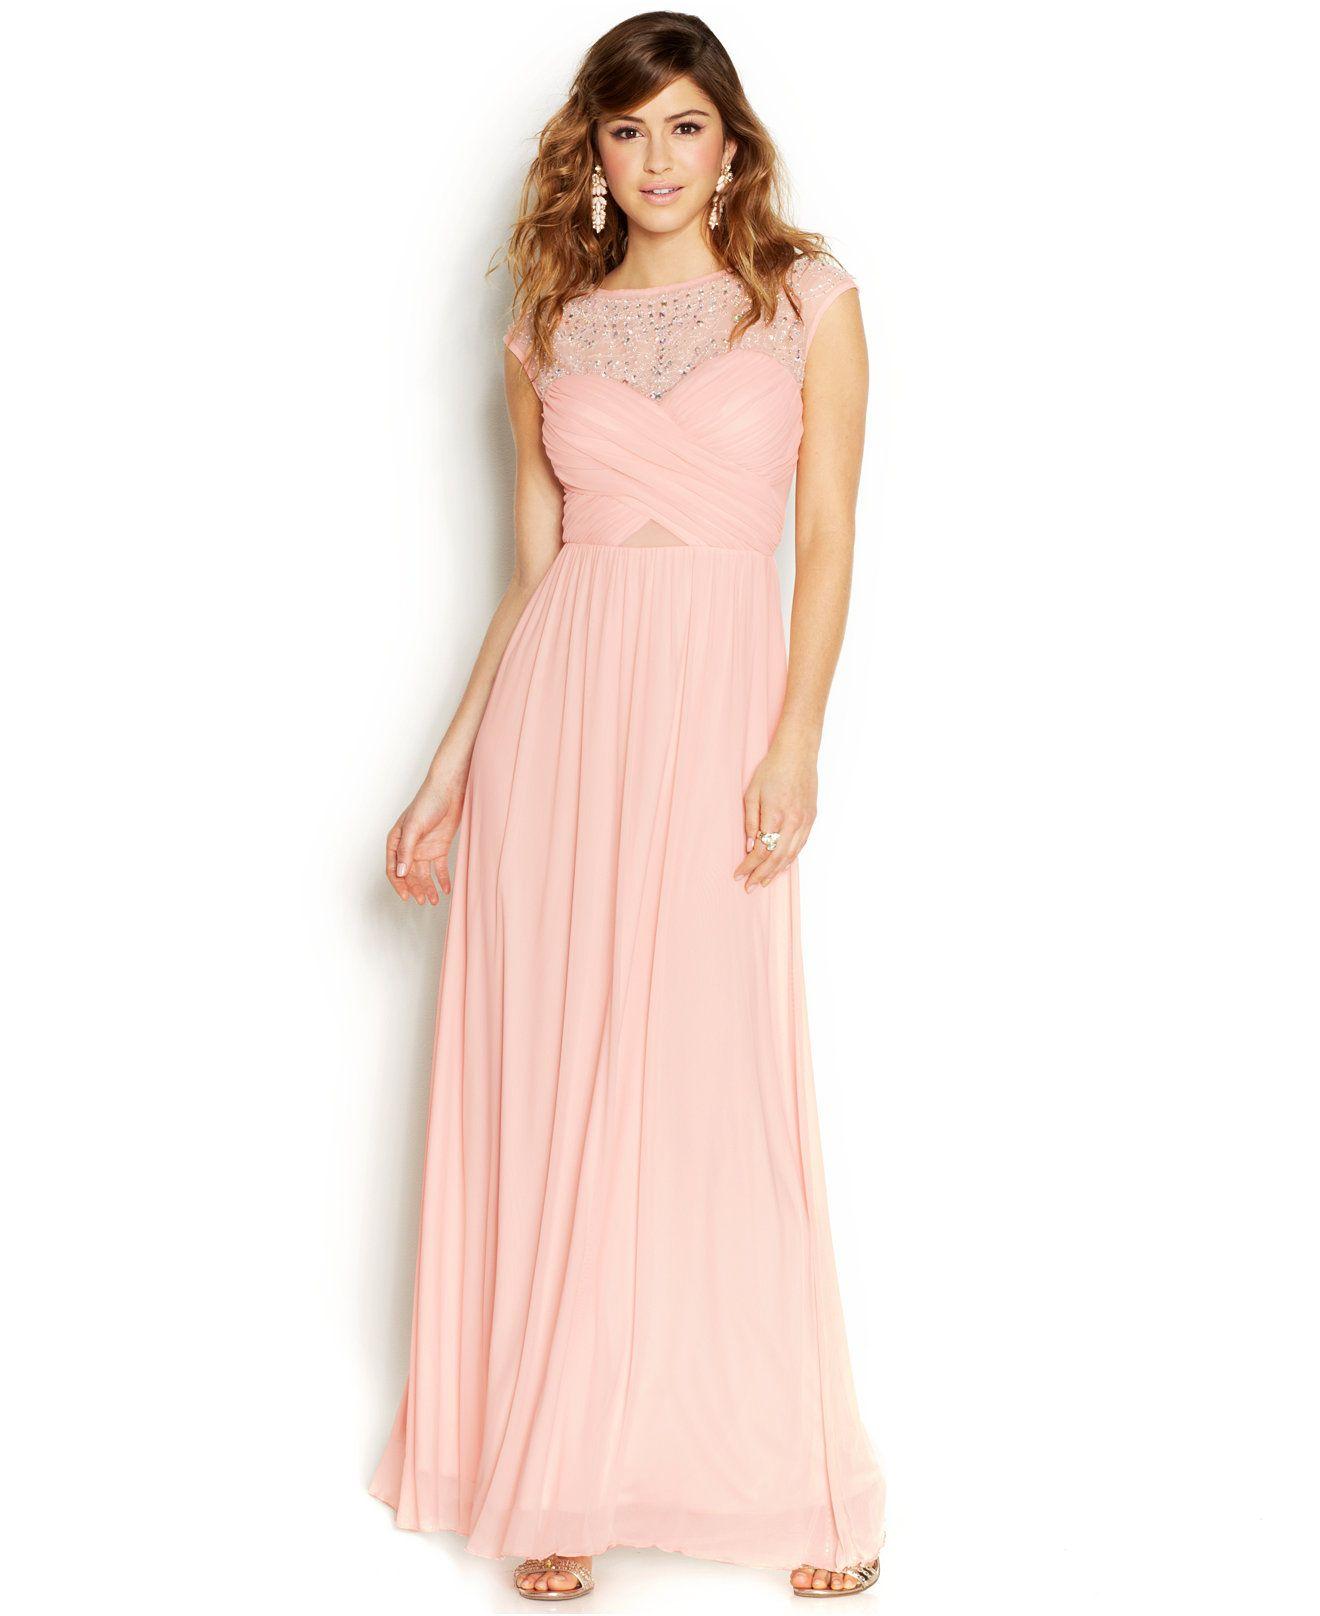 2fb98cc4be3 B Darlin Juniors  Beaded Illusion Gown - Juniors Shop All Prom Dresses -  Macy s